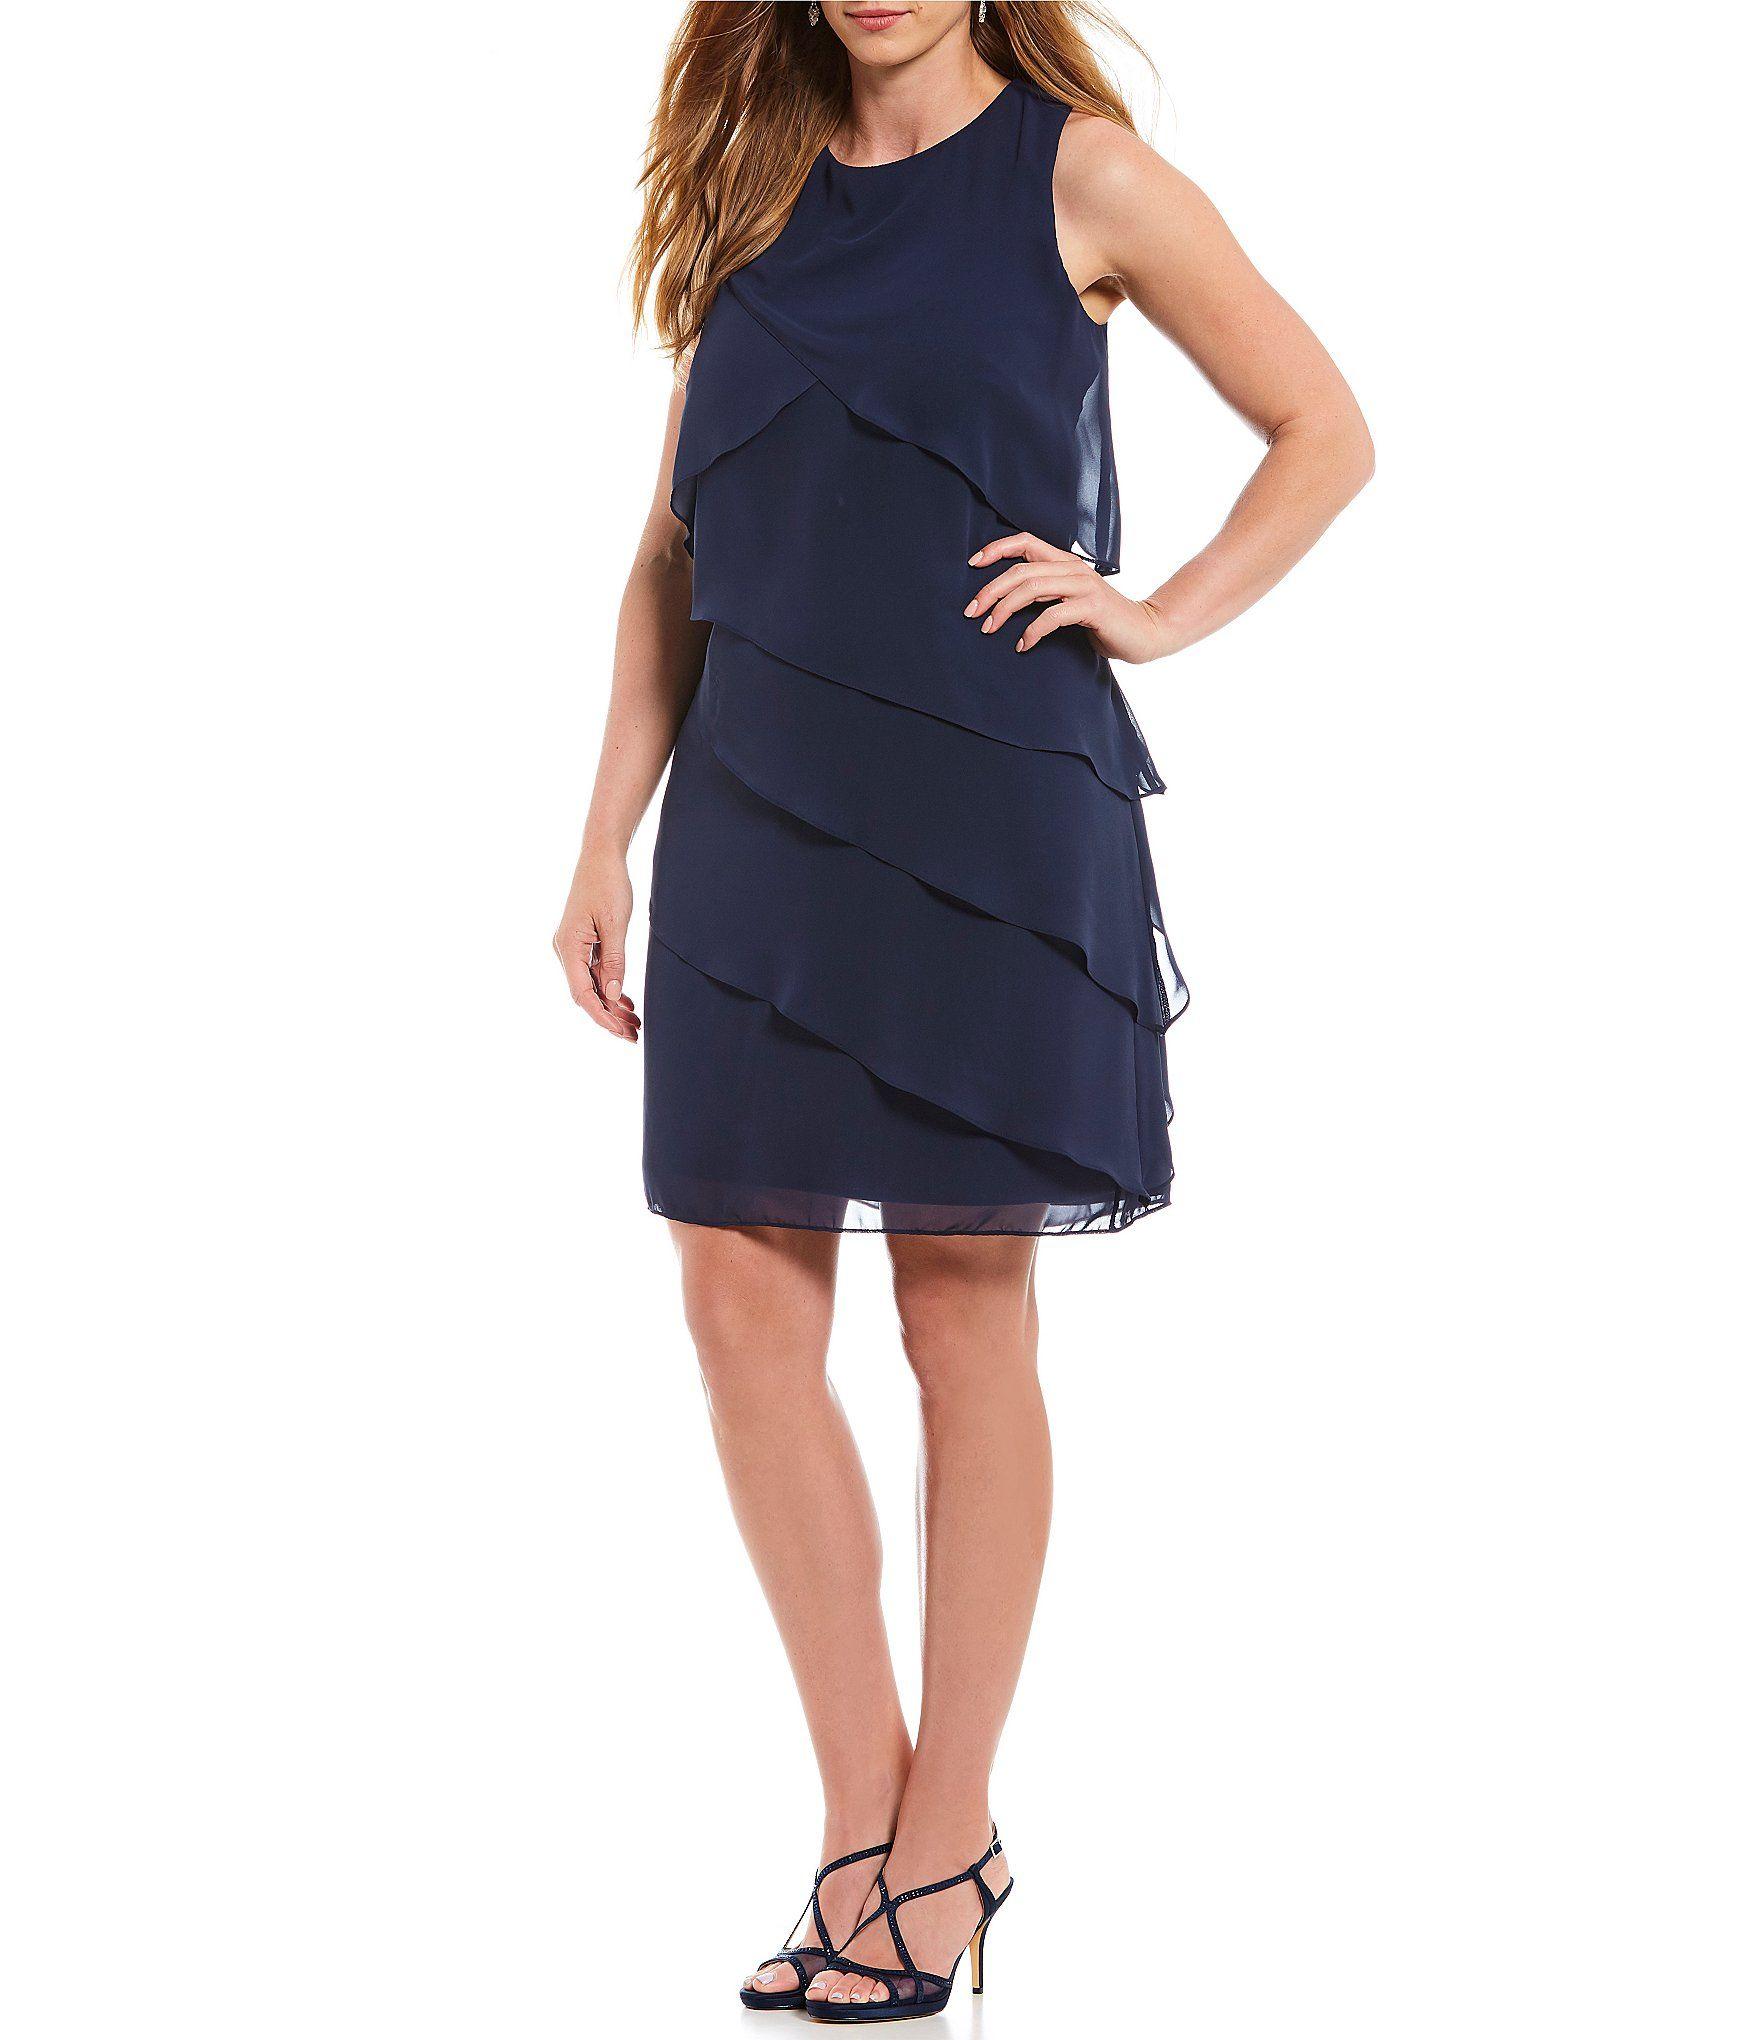 6e09344eea Navy Blue Cocktail Dress Dillards - Data Dynamic AG